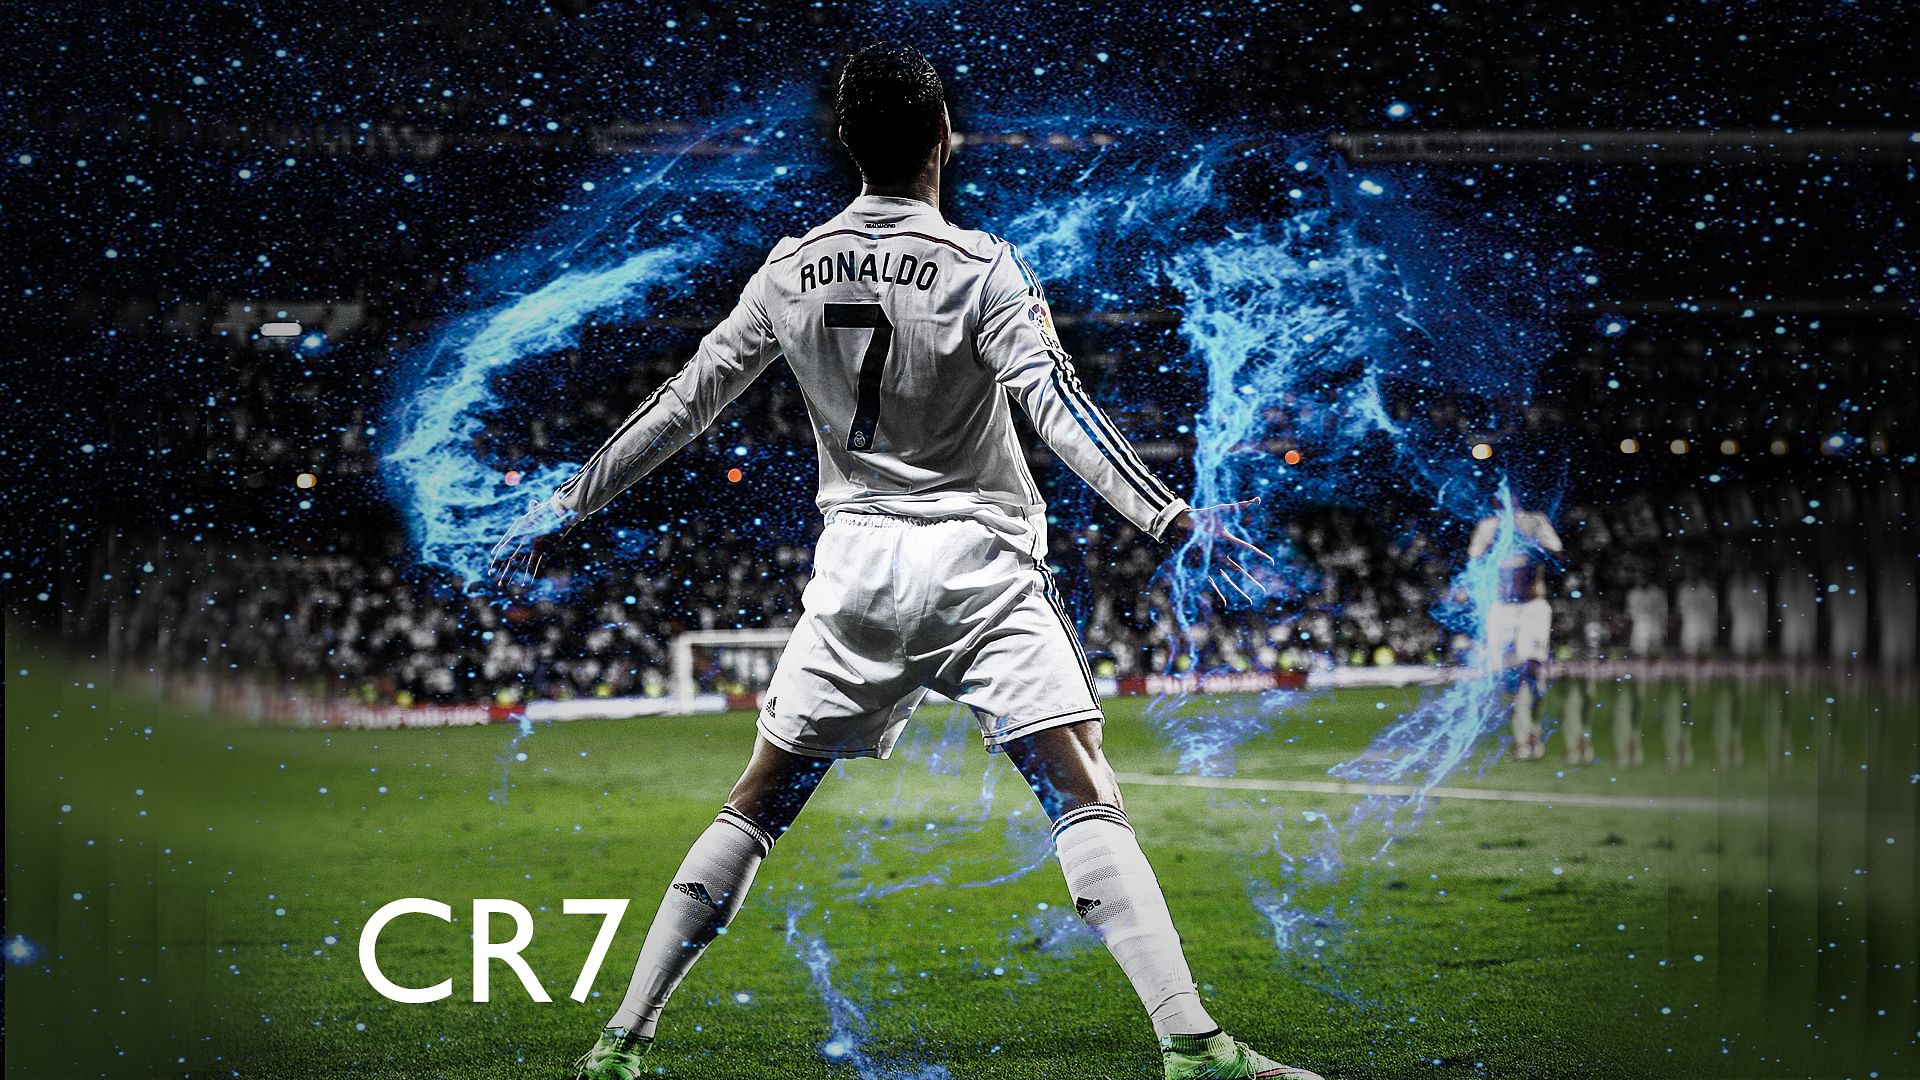 ronaldo football wallpapers hd - photo #30